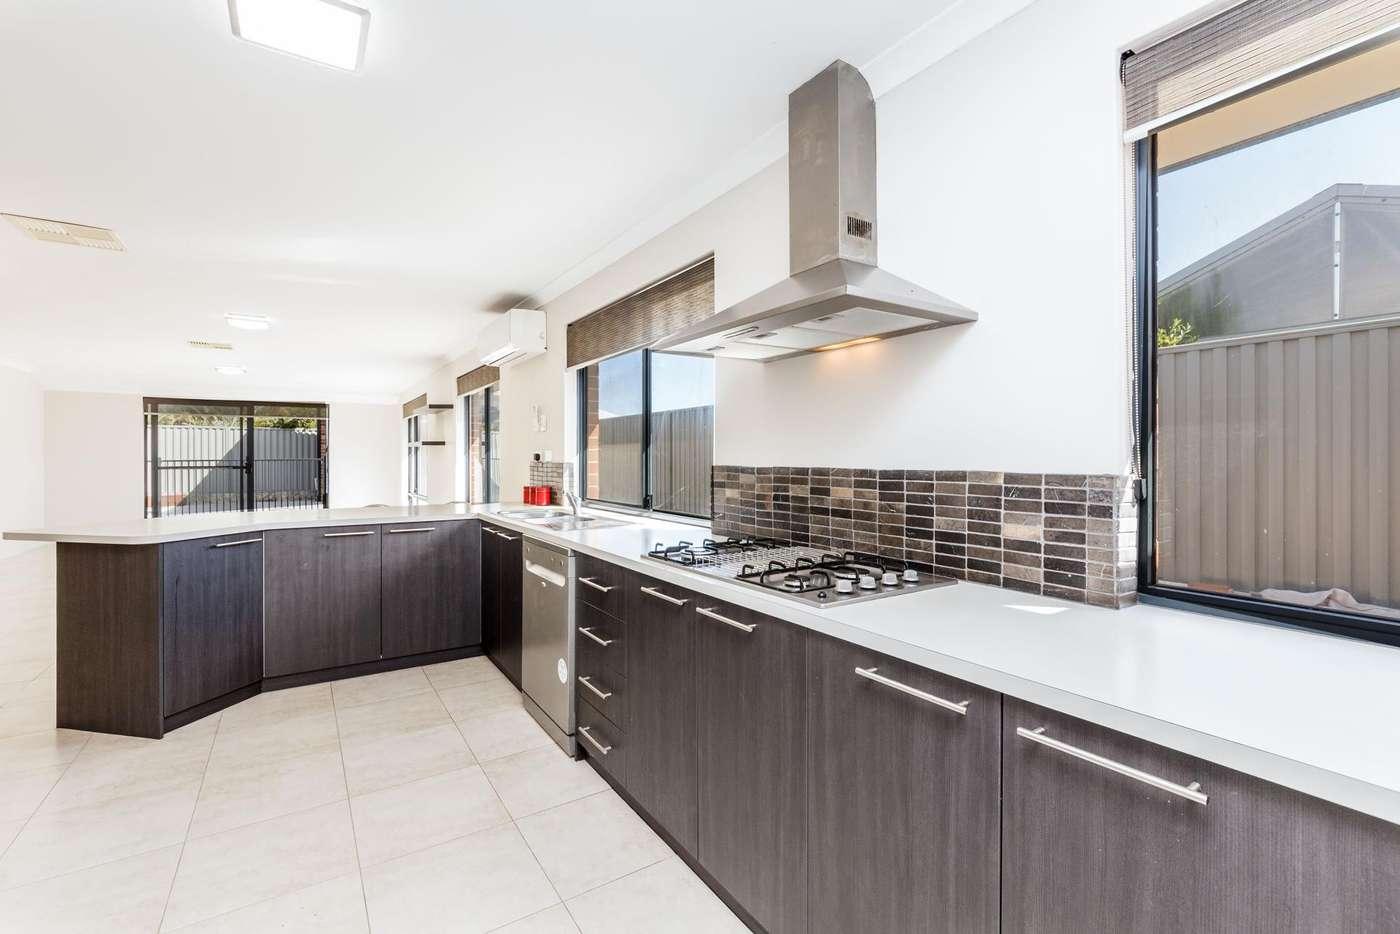 Main view of Homely house listing, 14 Baldwin Link, Piara Waters WA 6112